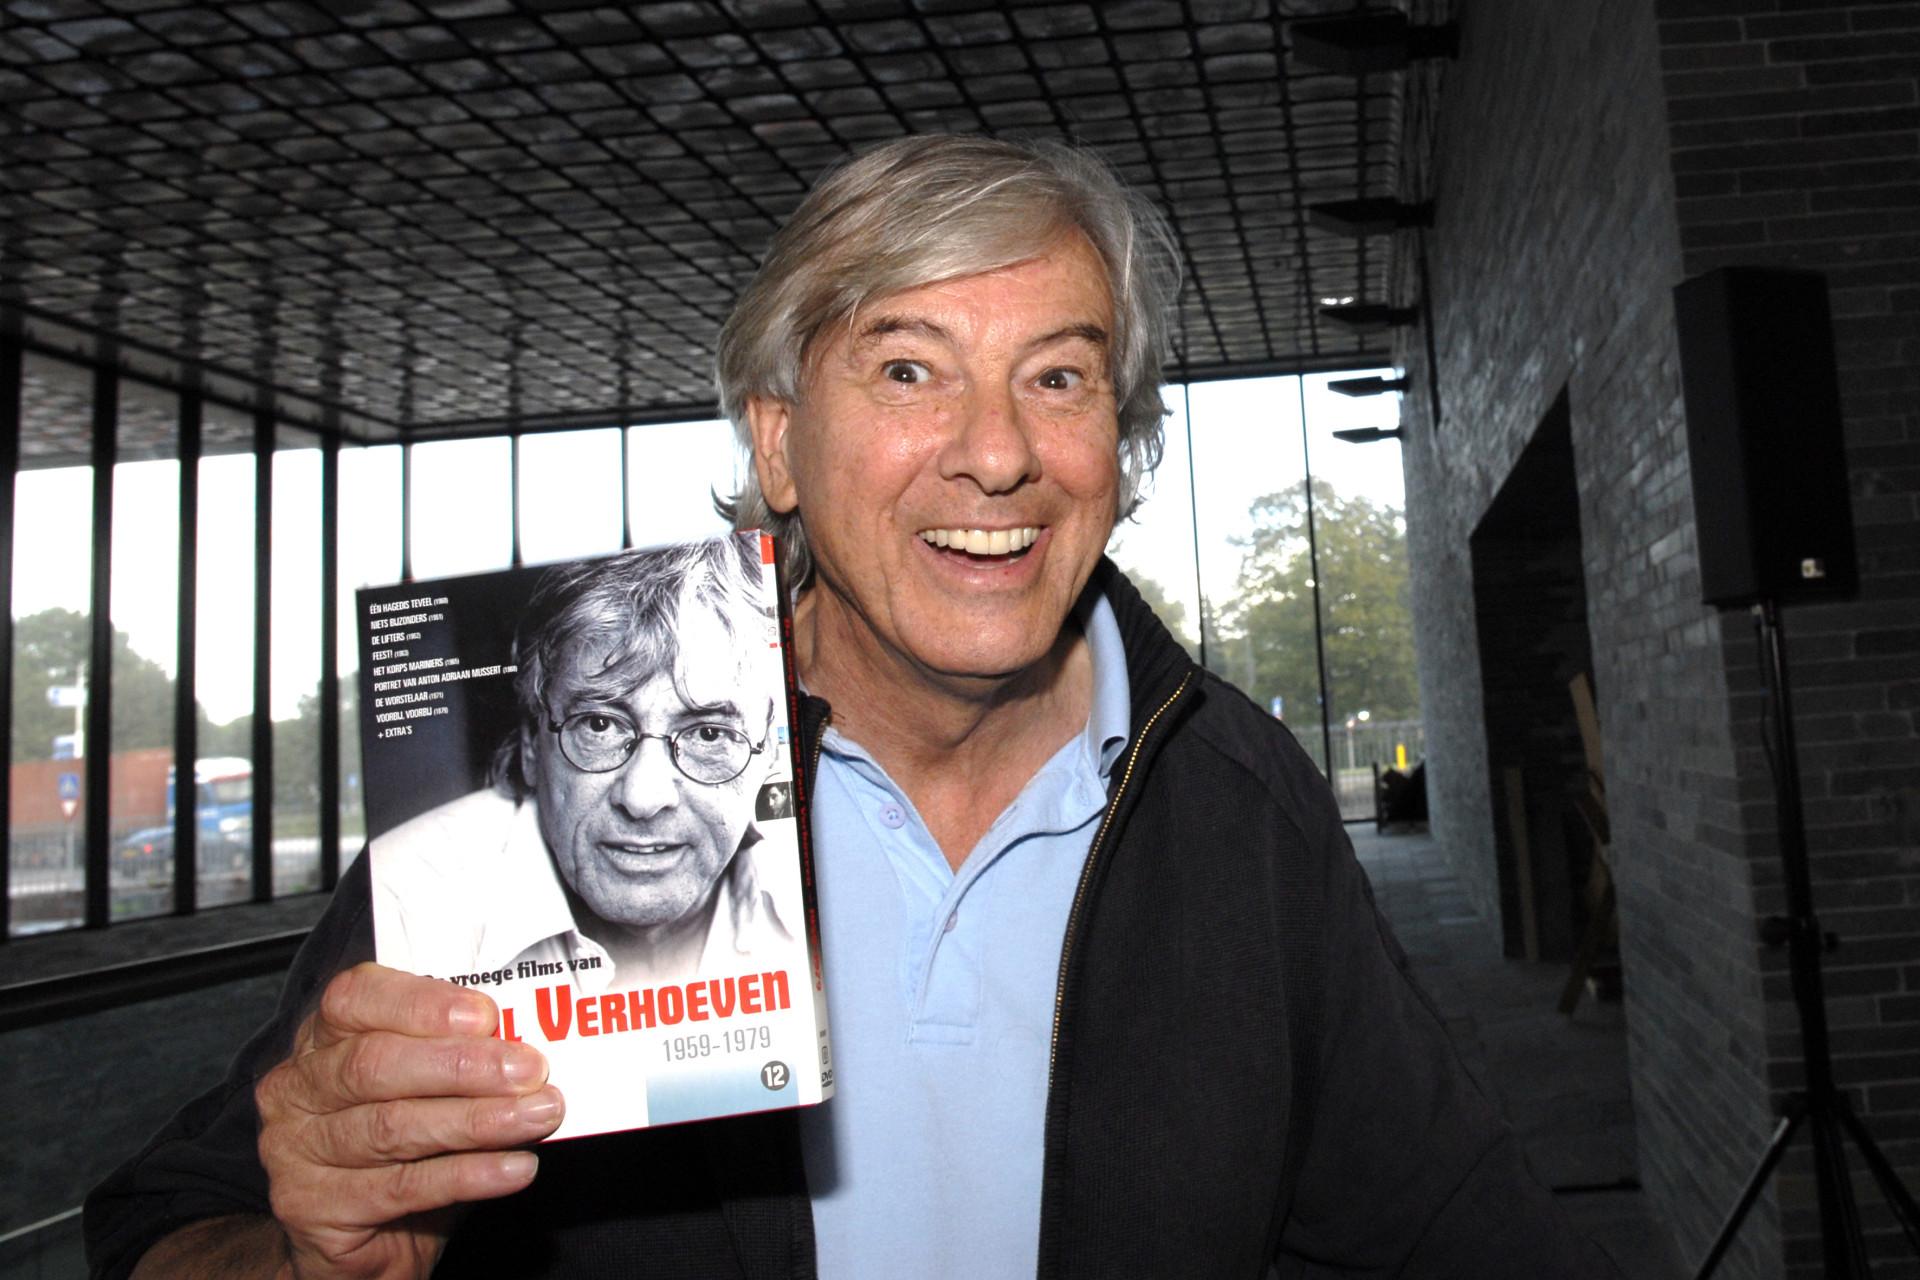 Kunst & controverse: de carrière van Paul Verhoeven